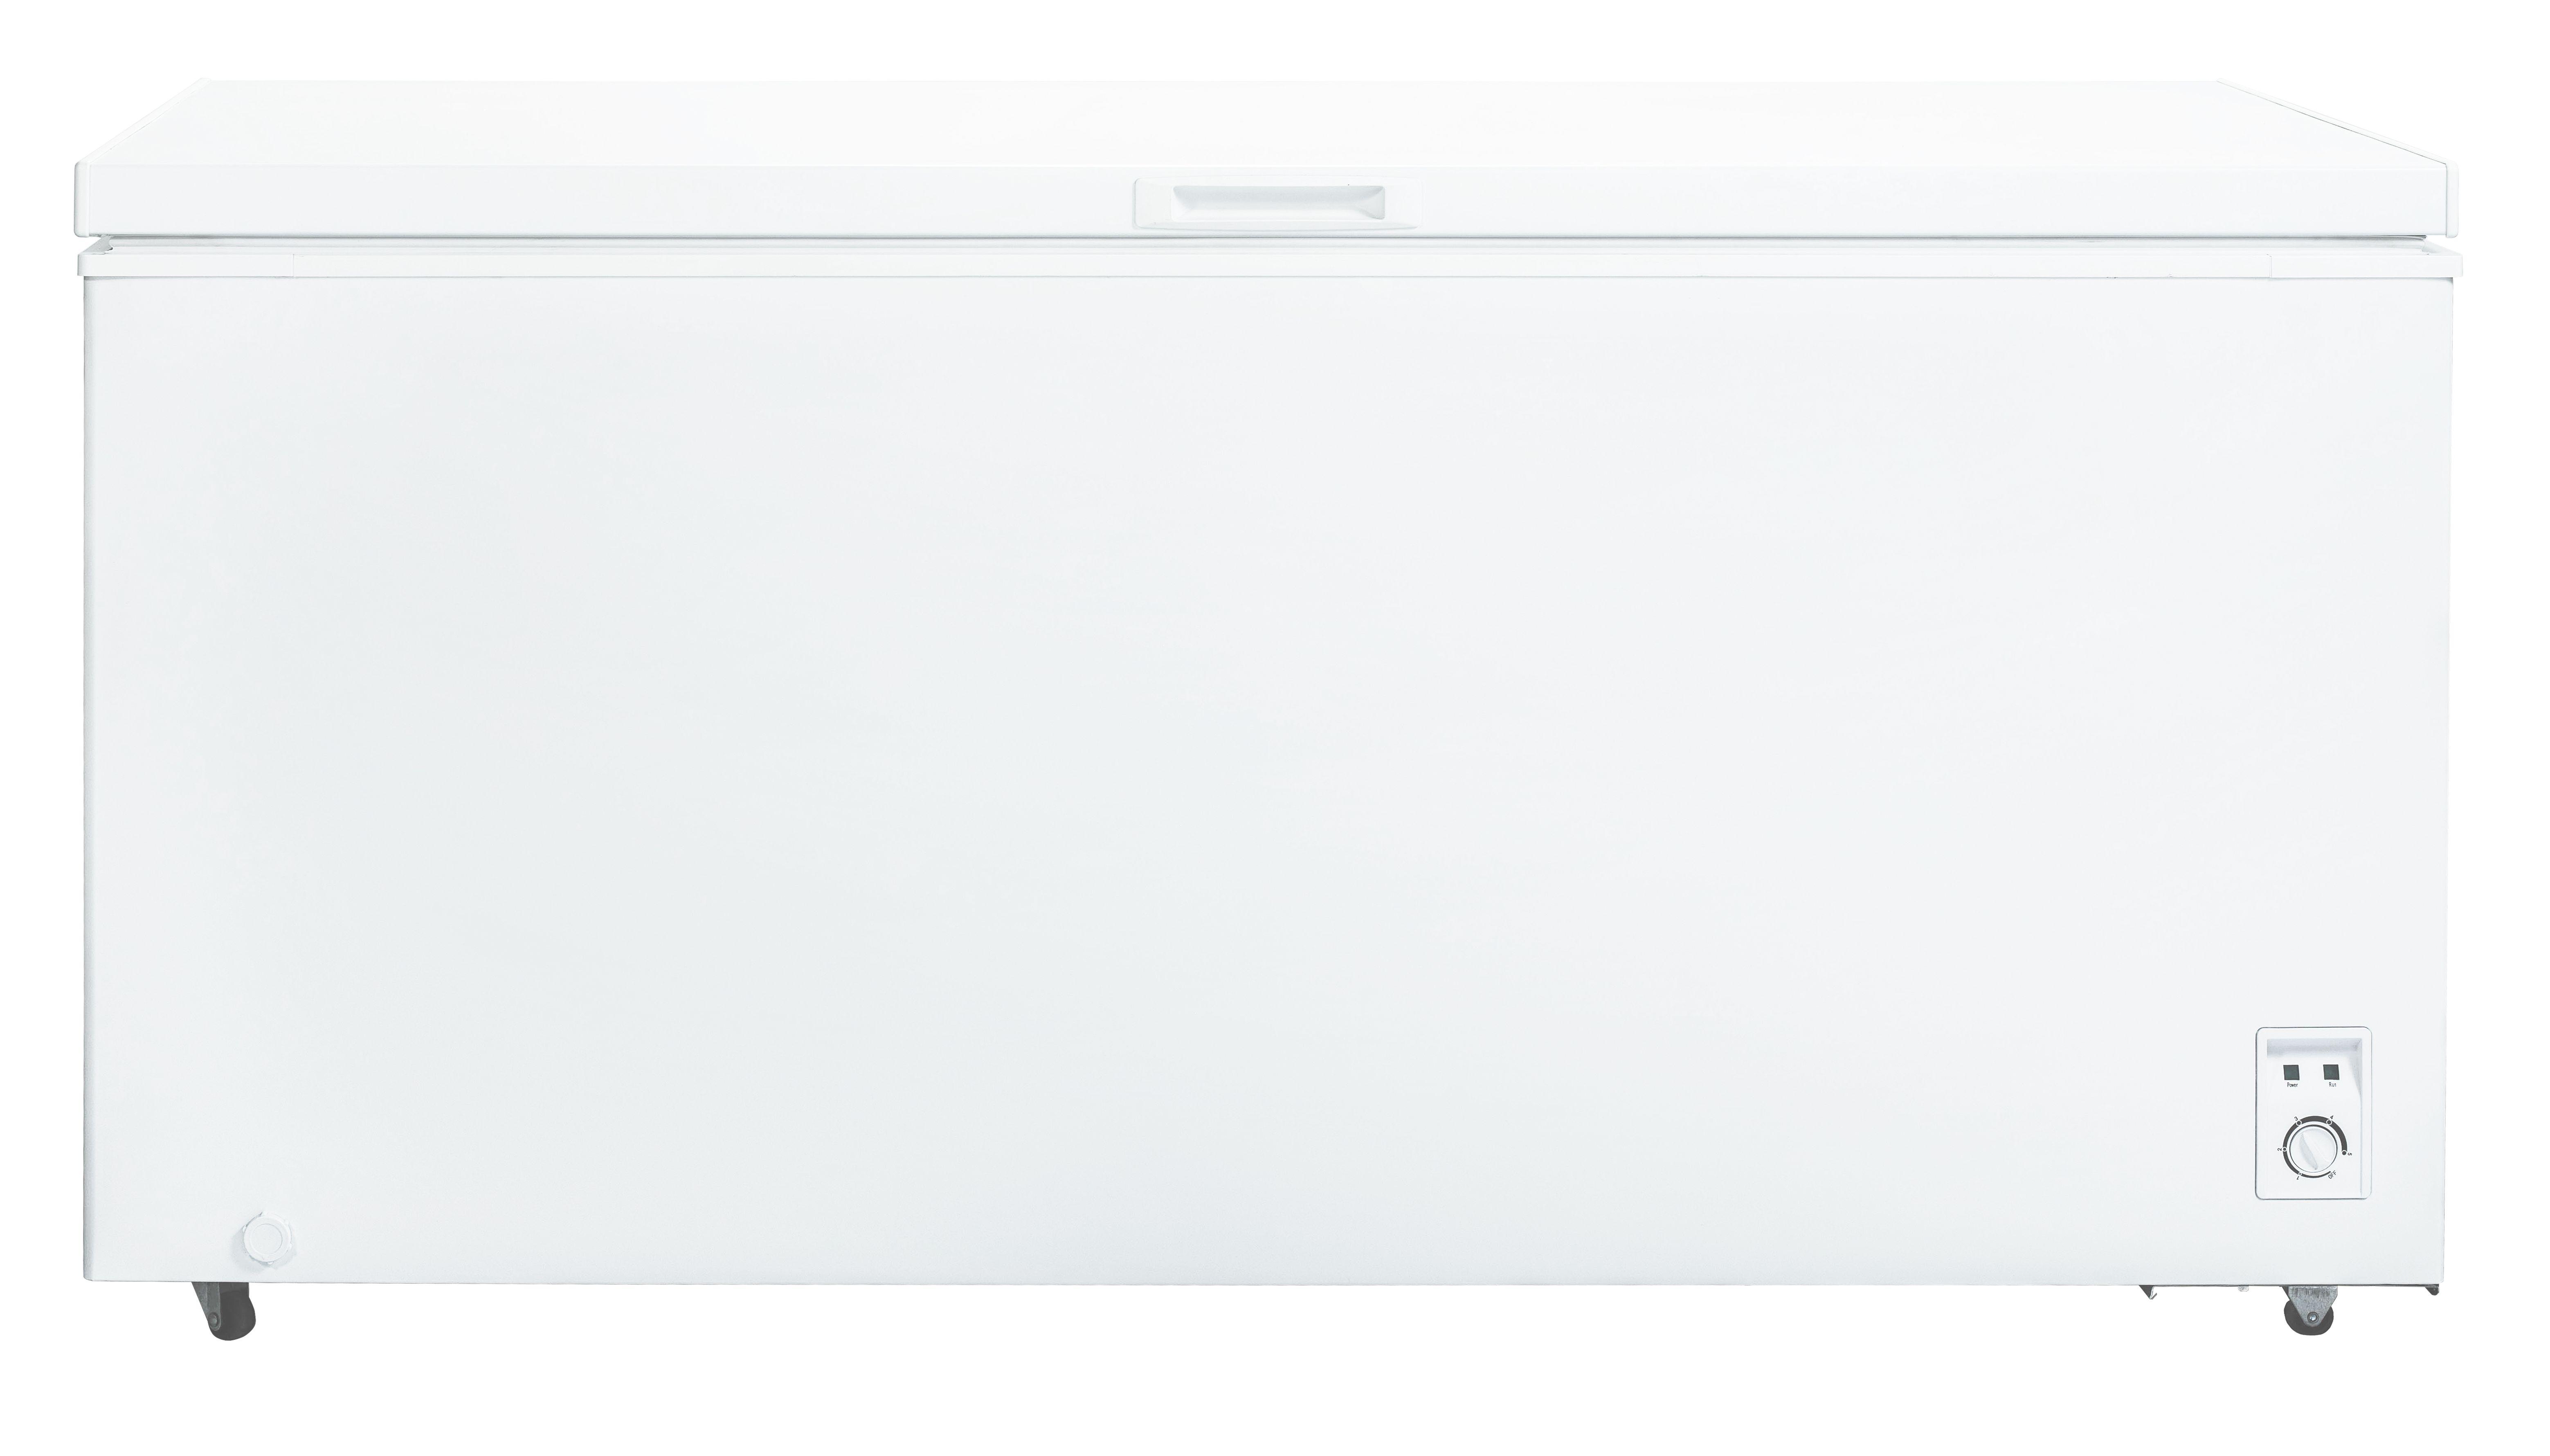 Kenmore 17182 17.7 cu. ft. Chest Freezer - White im test